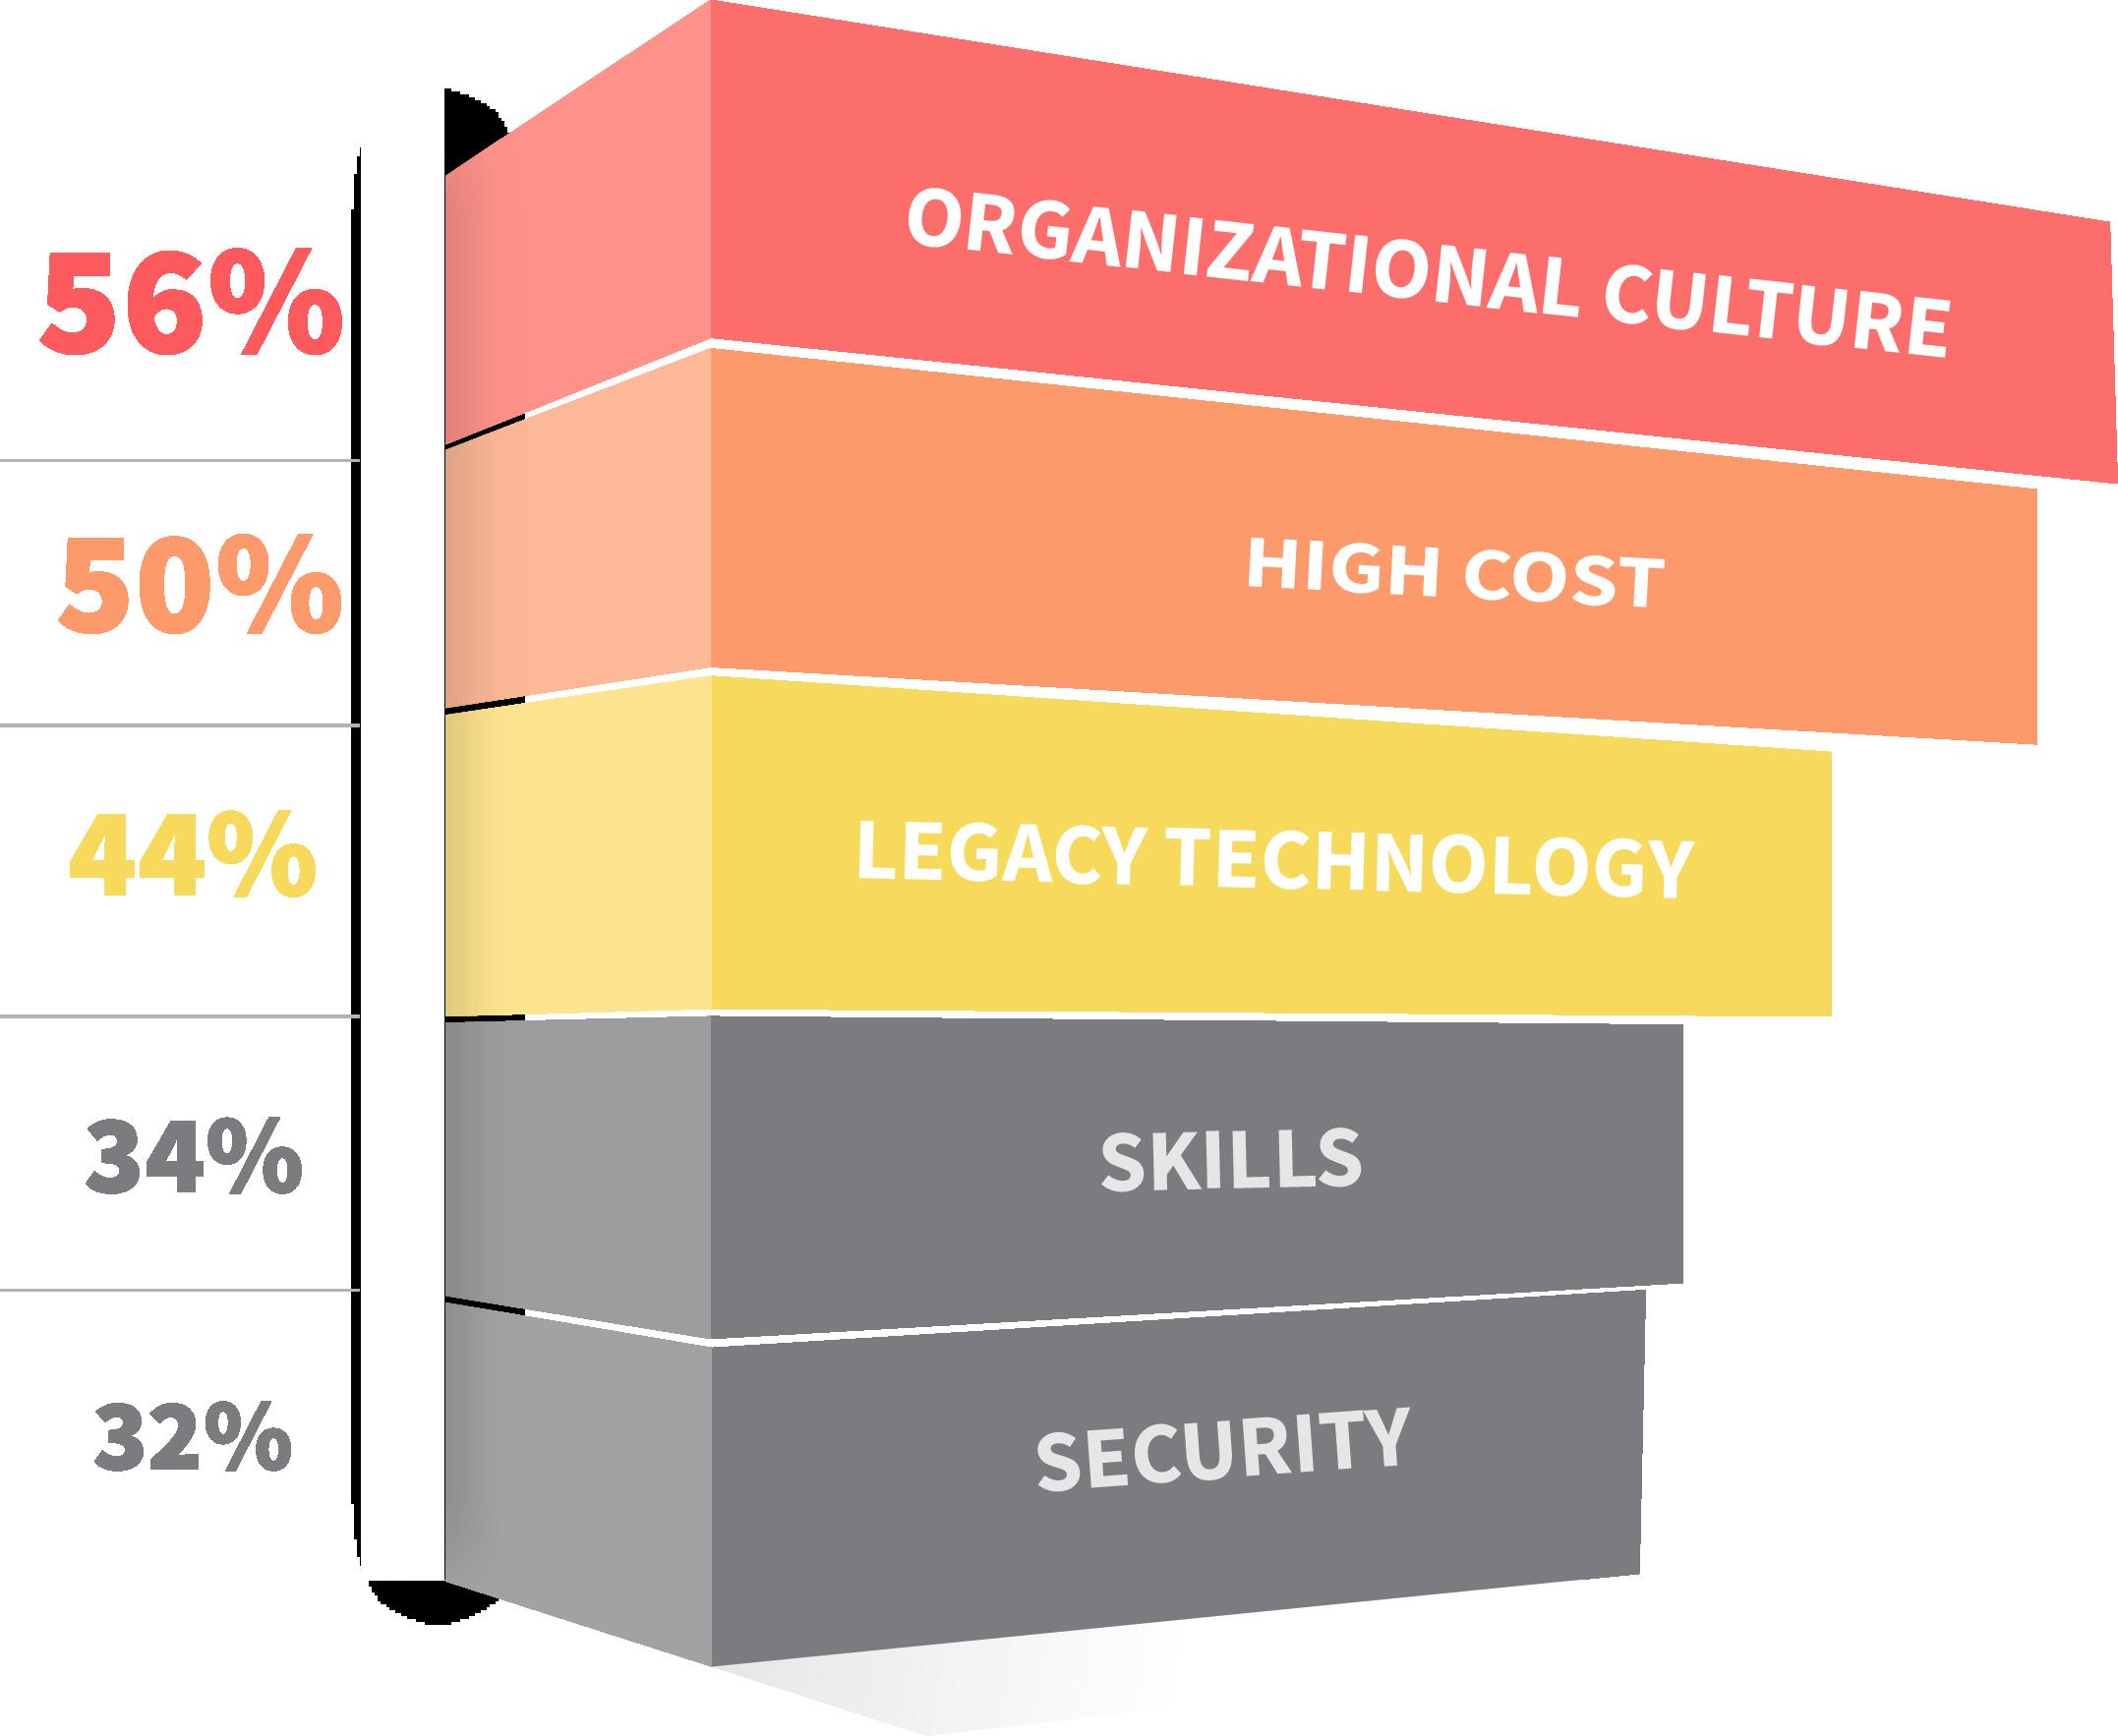 Top enterprise challenges to digital transformation